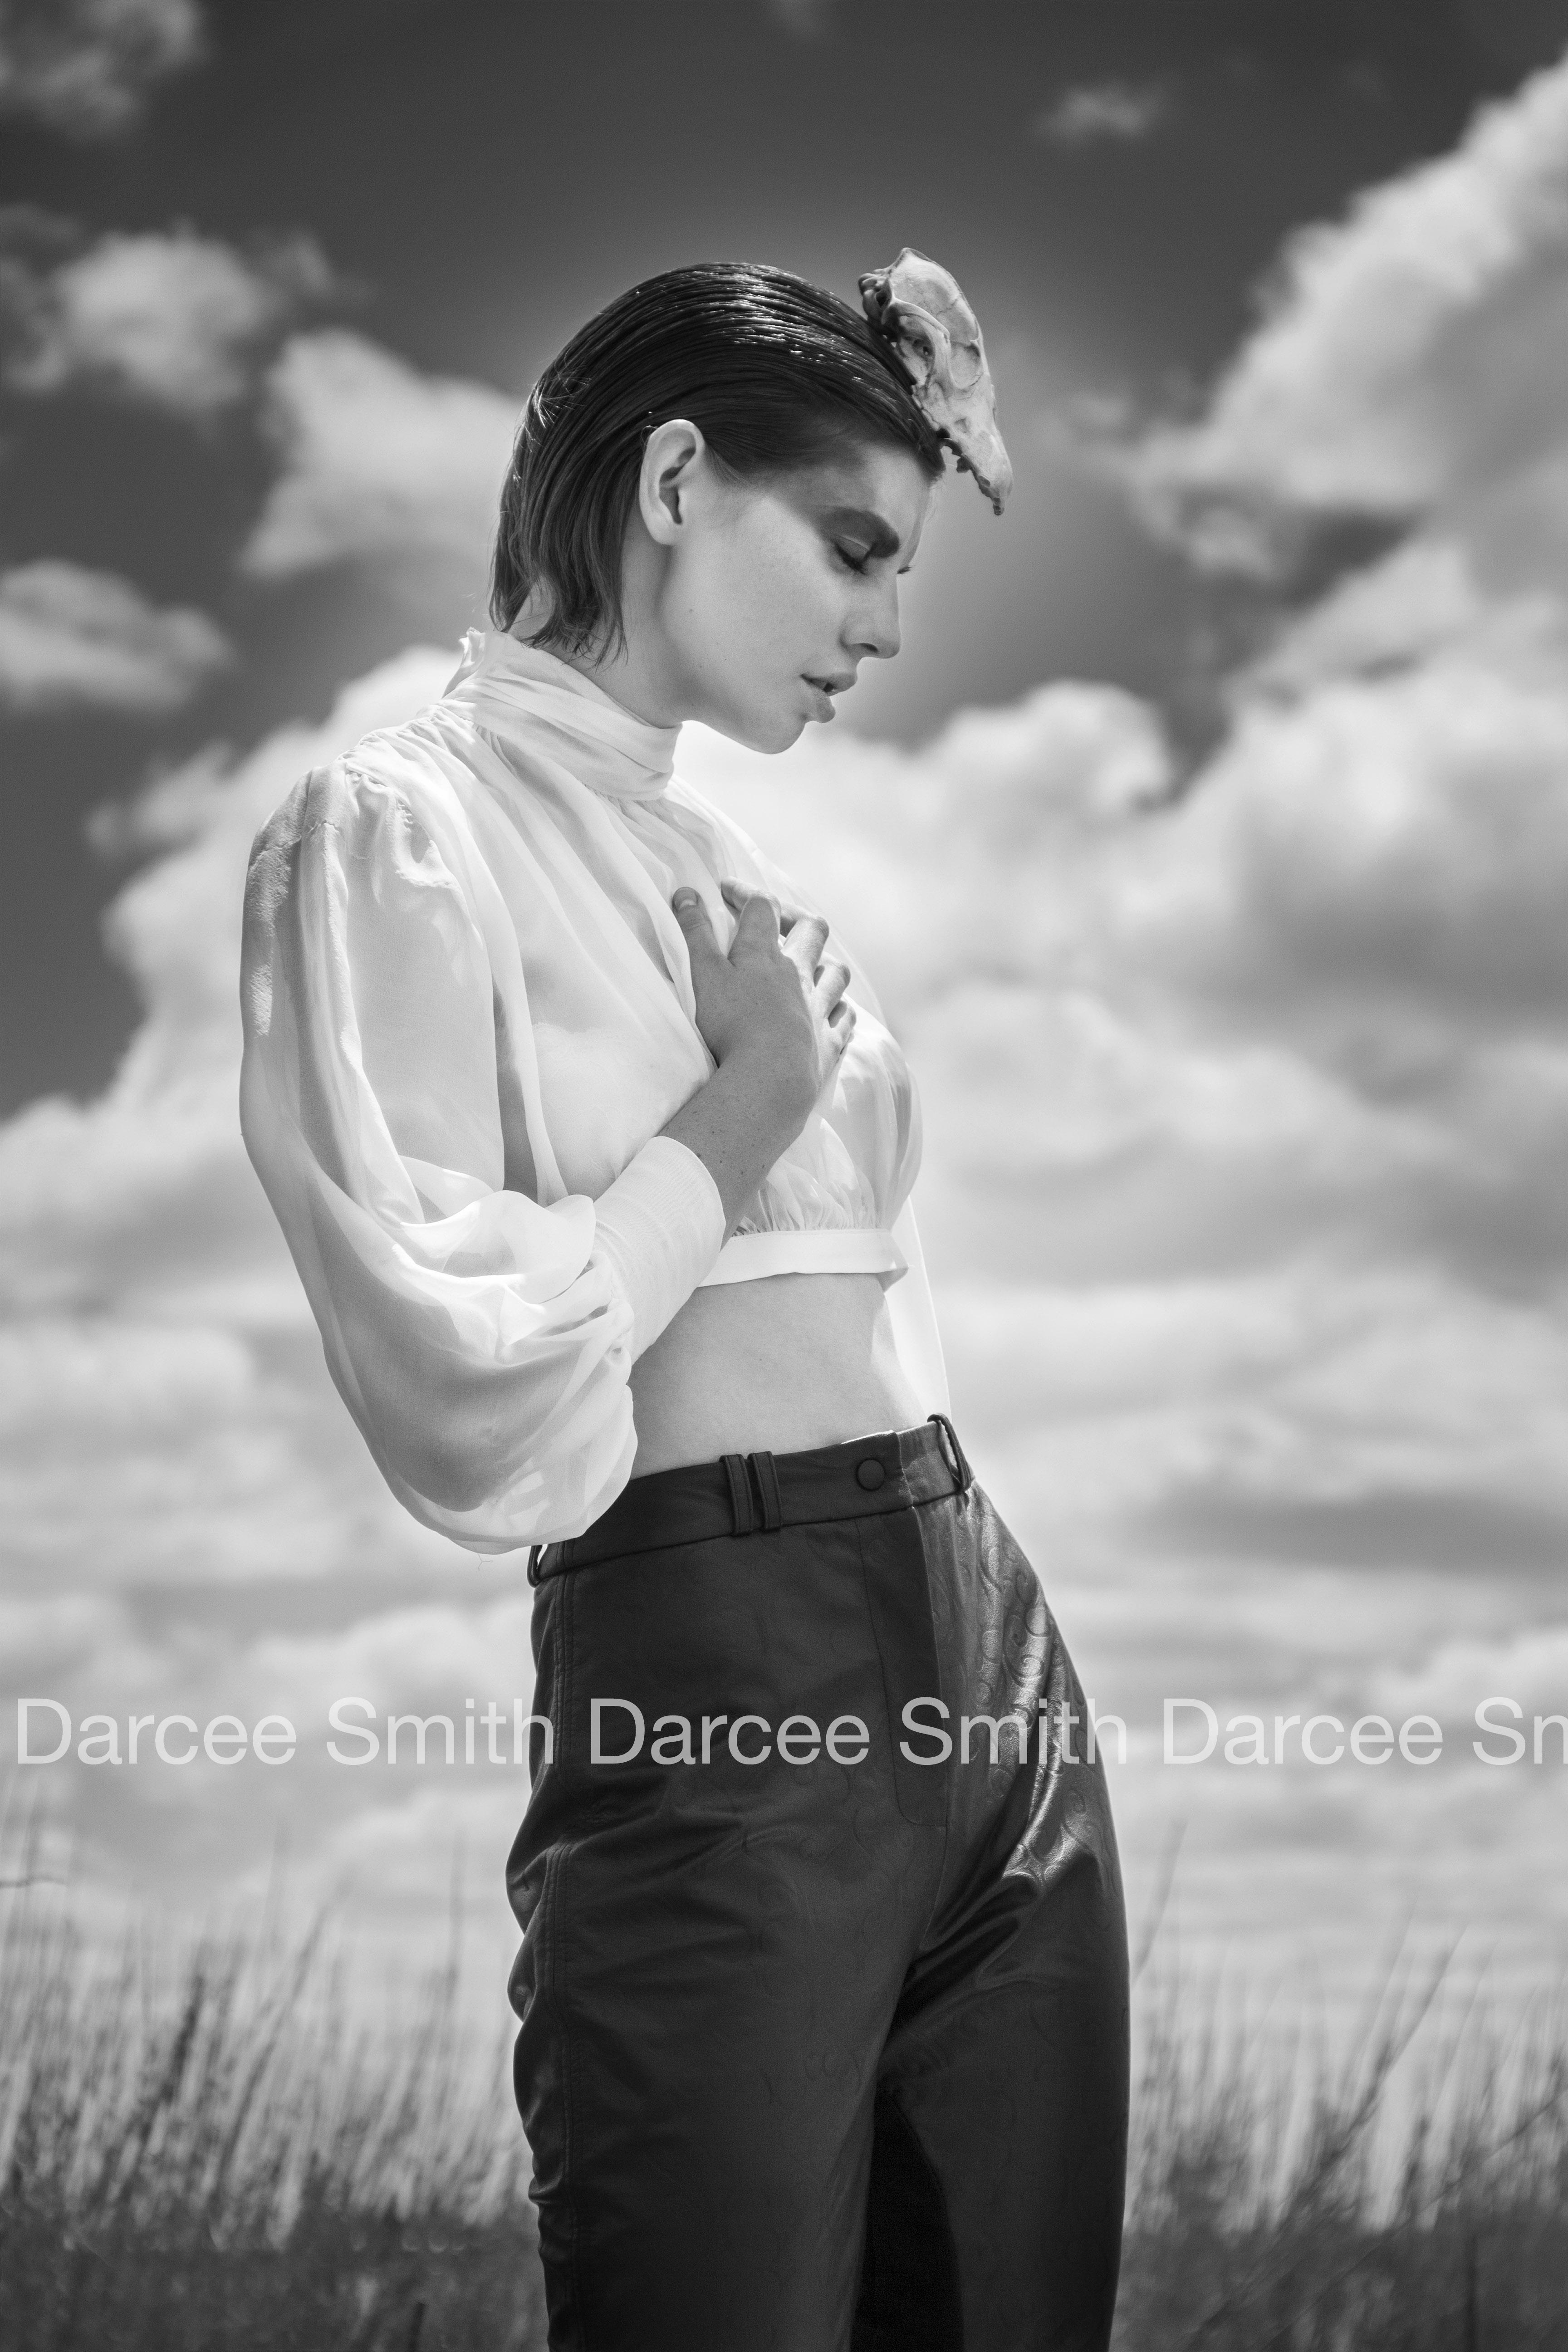 2. Darcee Smith